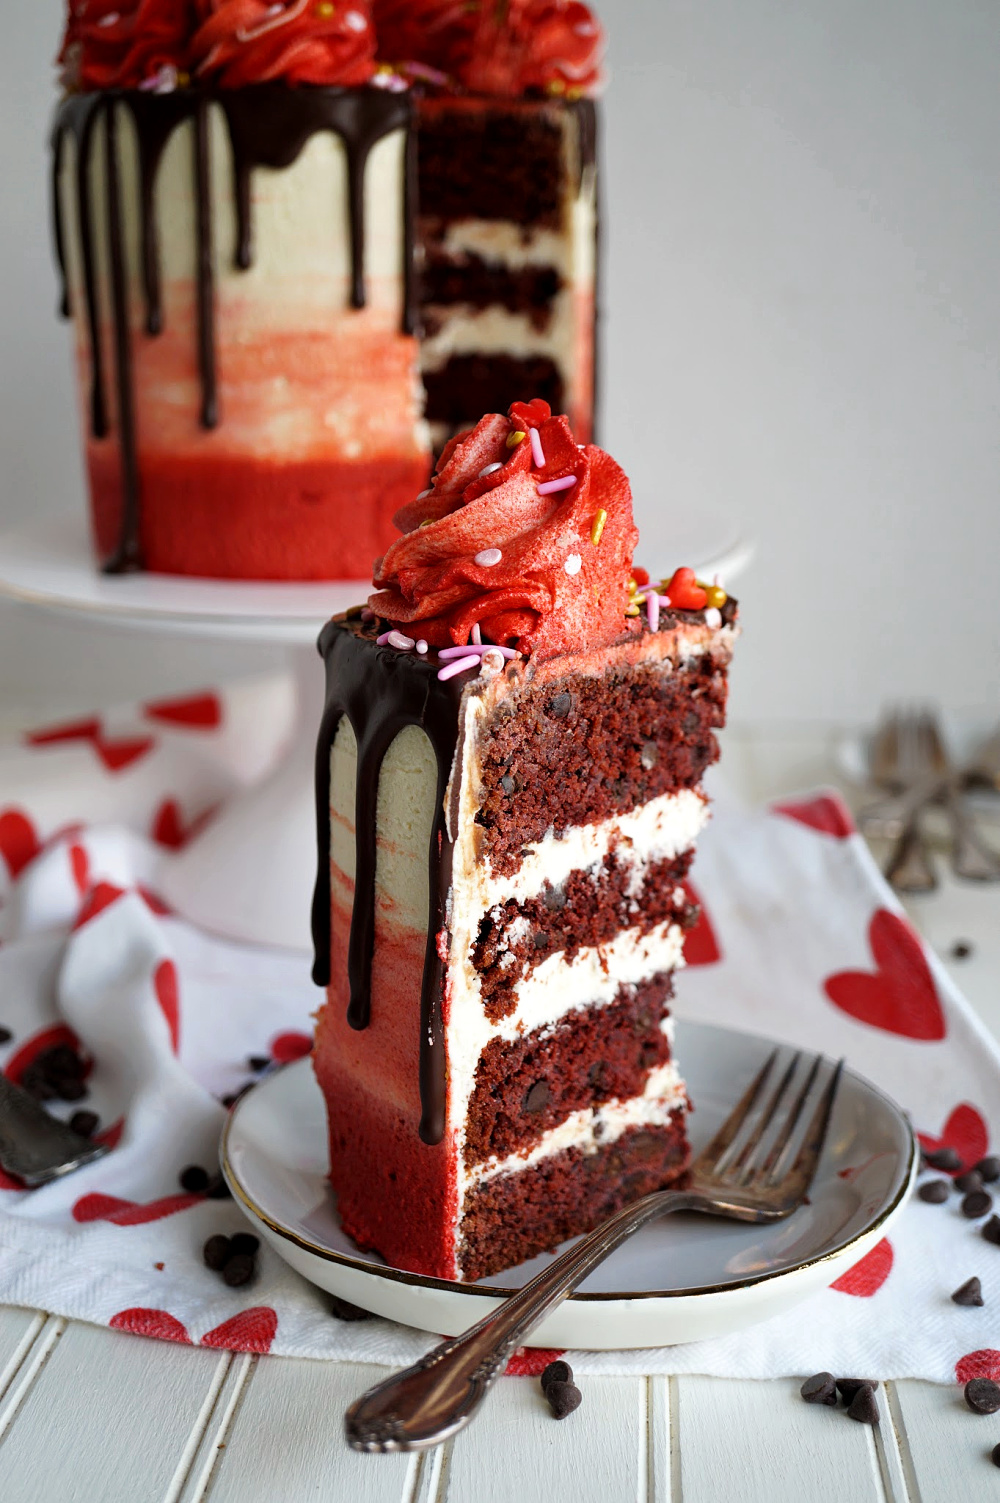 cut slice of red velvet chocolate chip cake